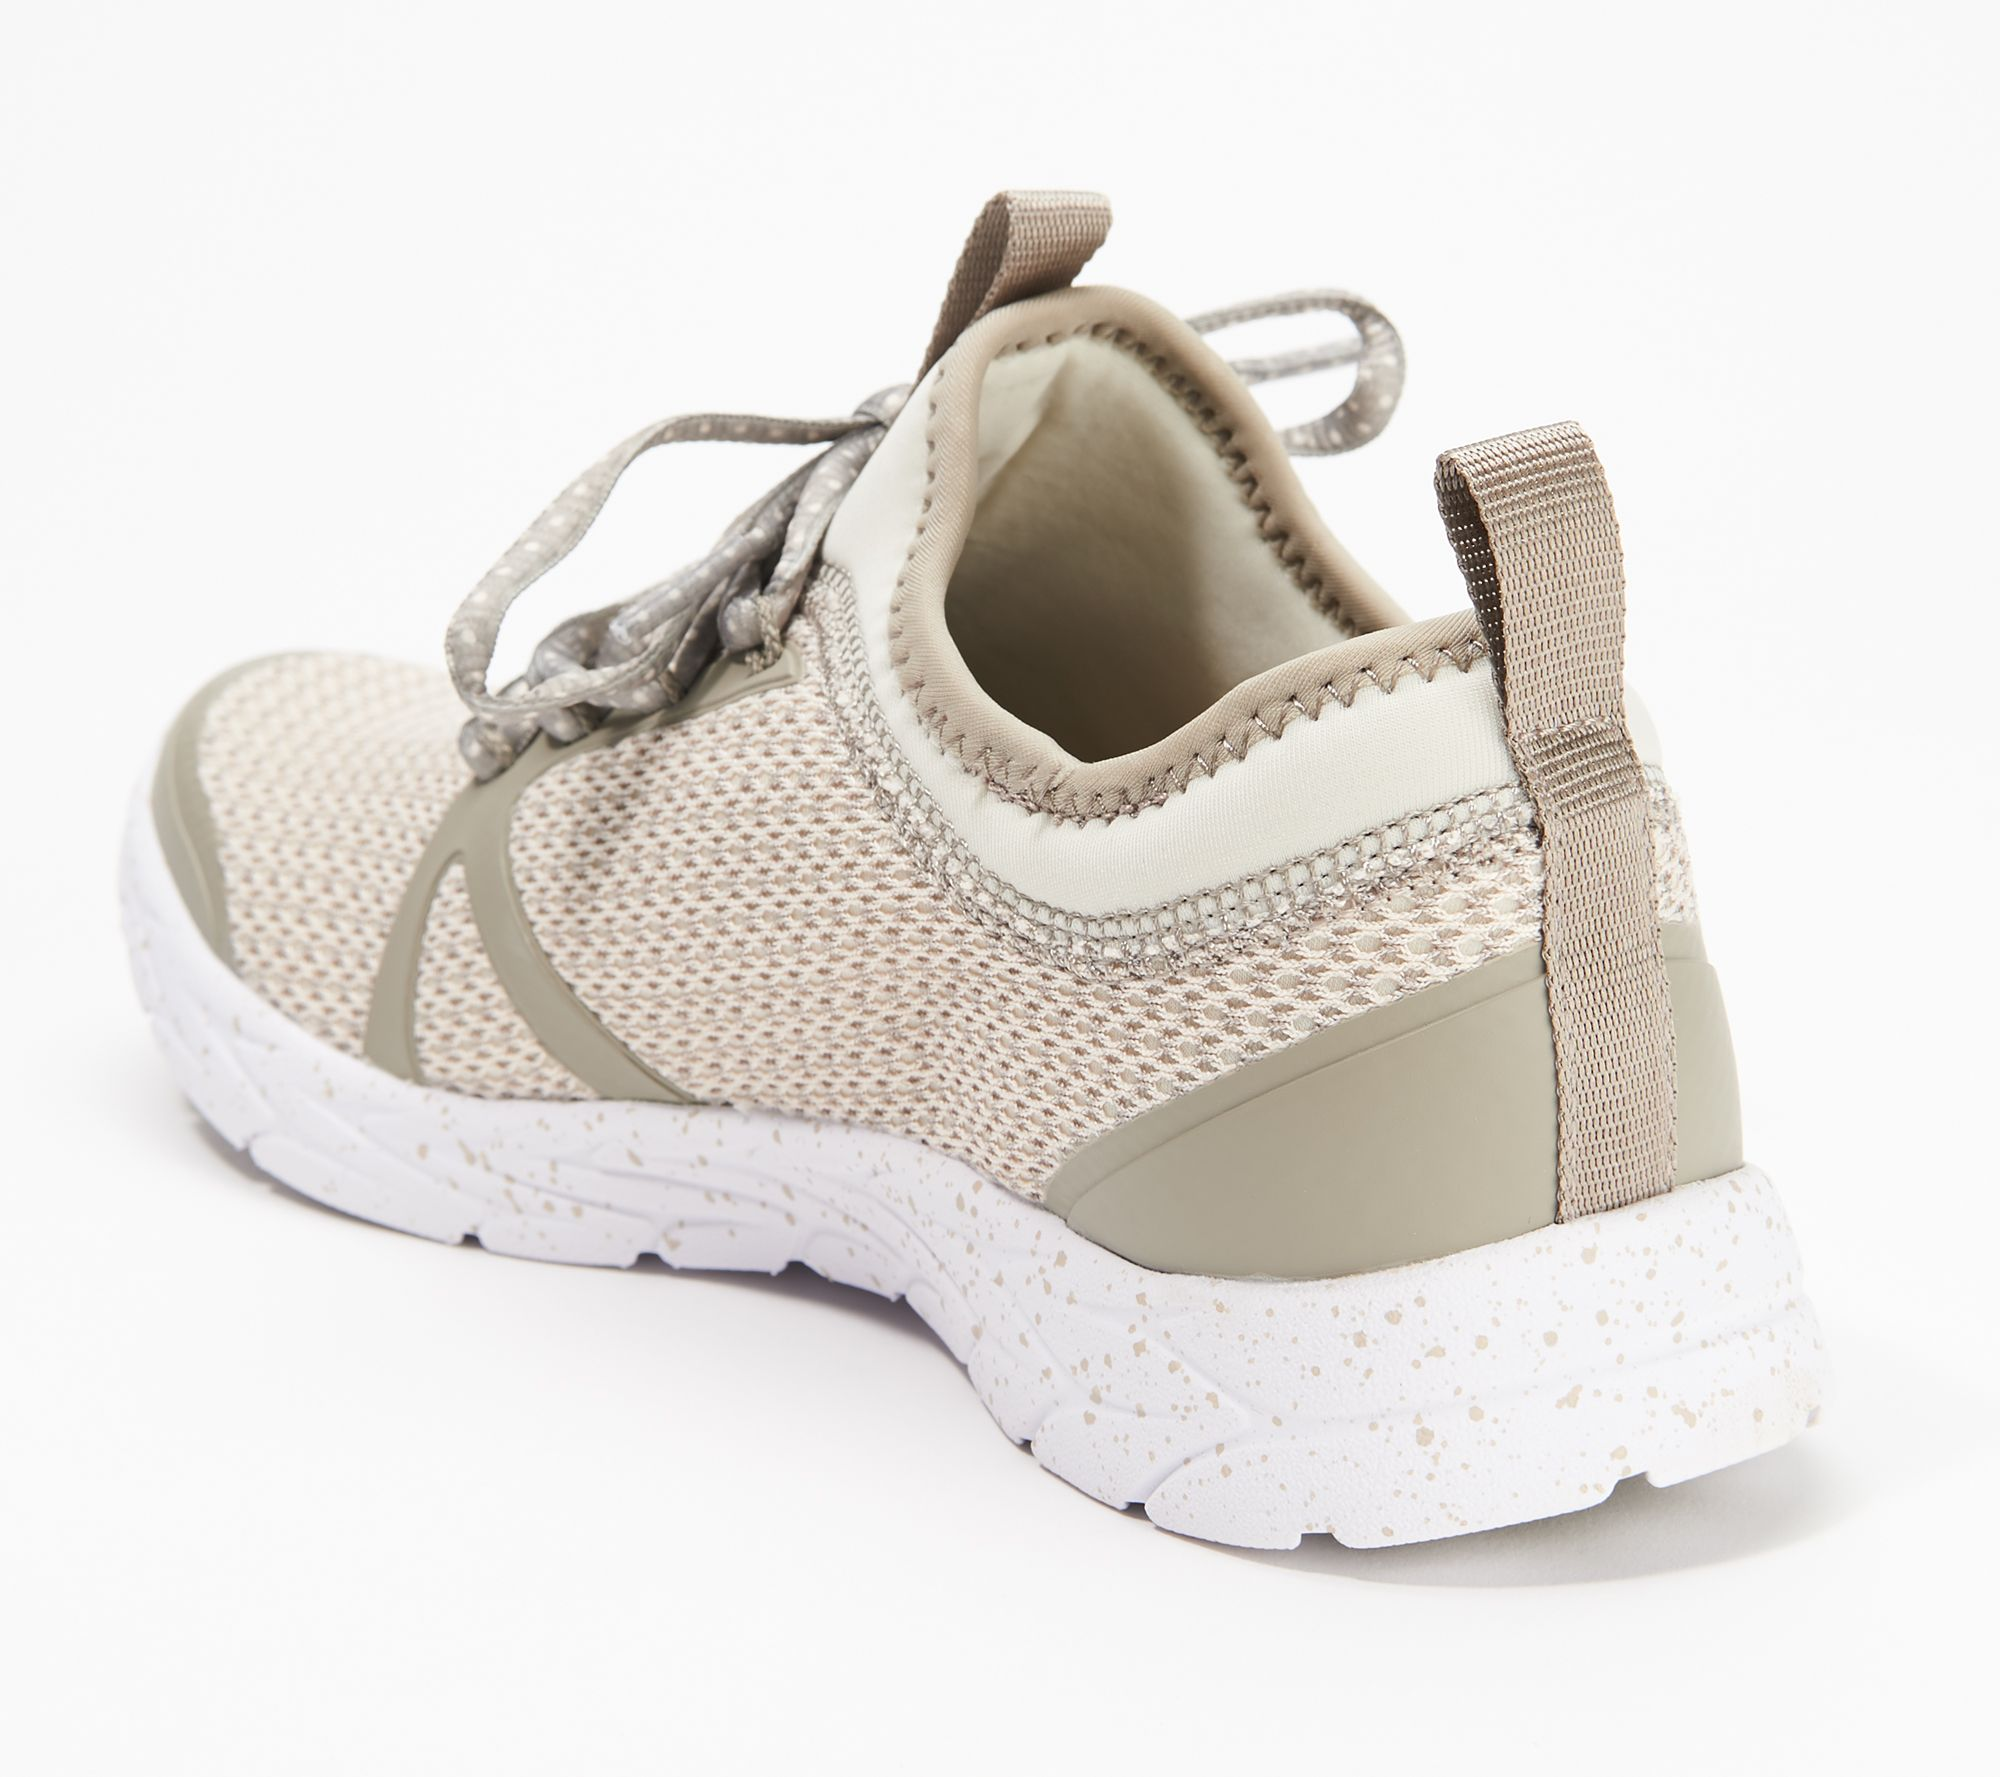 4db6e4dae80 Vionic Mesh Lace-Up Sneakers - Alma - Page 1 — QVC.com